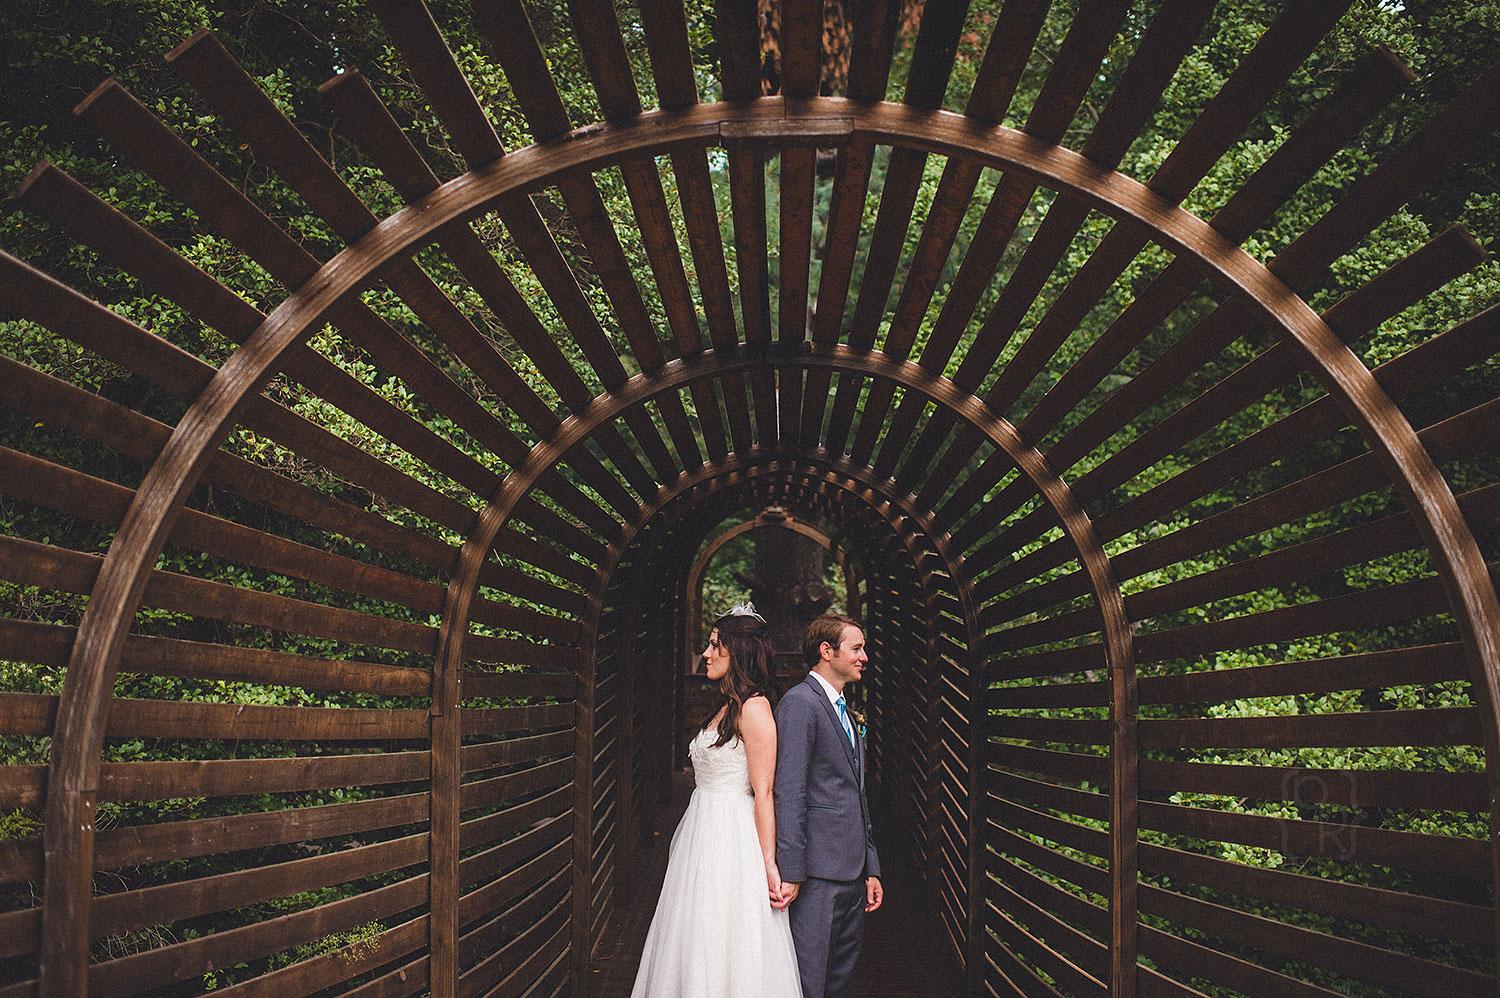 pat-robinson-photography-tyler-arboretum-wedding-36.jpg